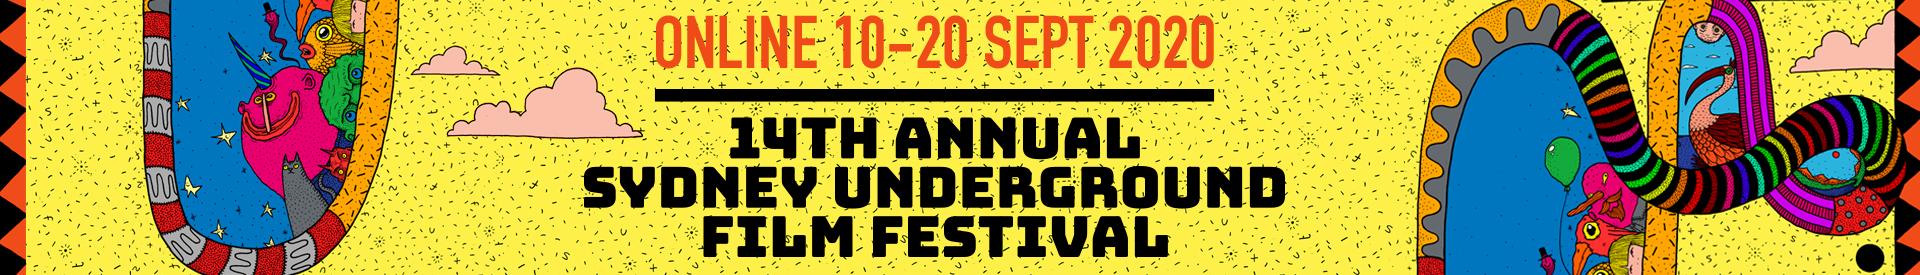 Sydney Underground Film Festival 2020